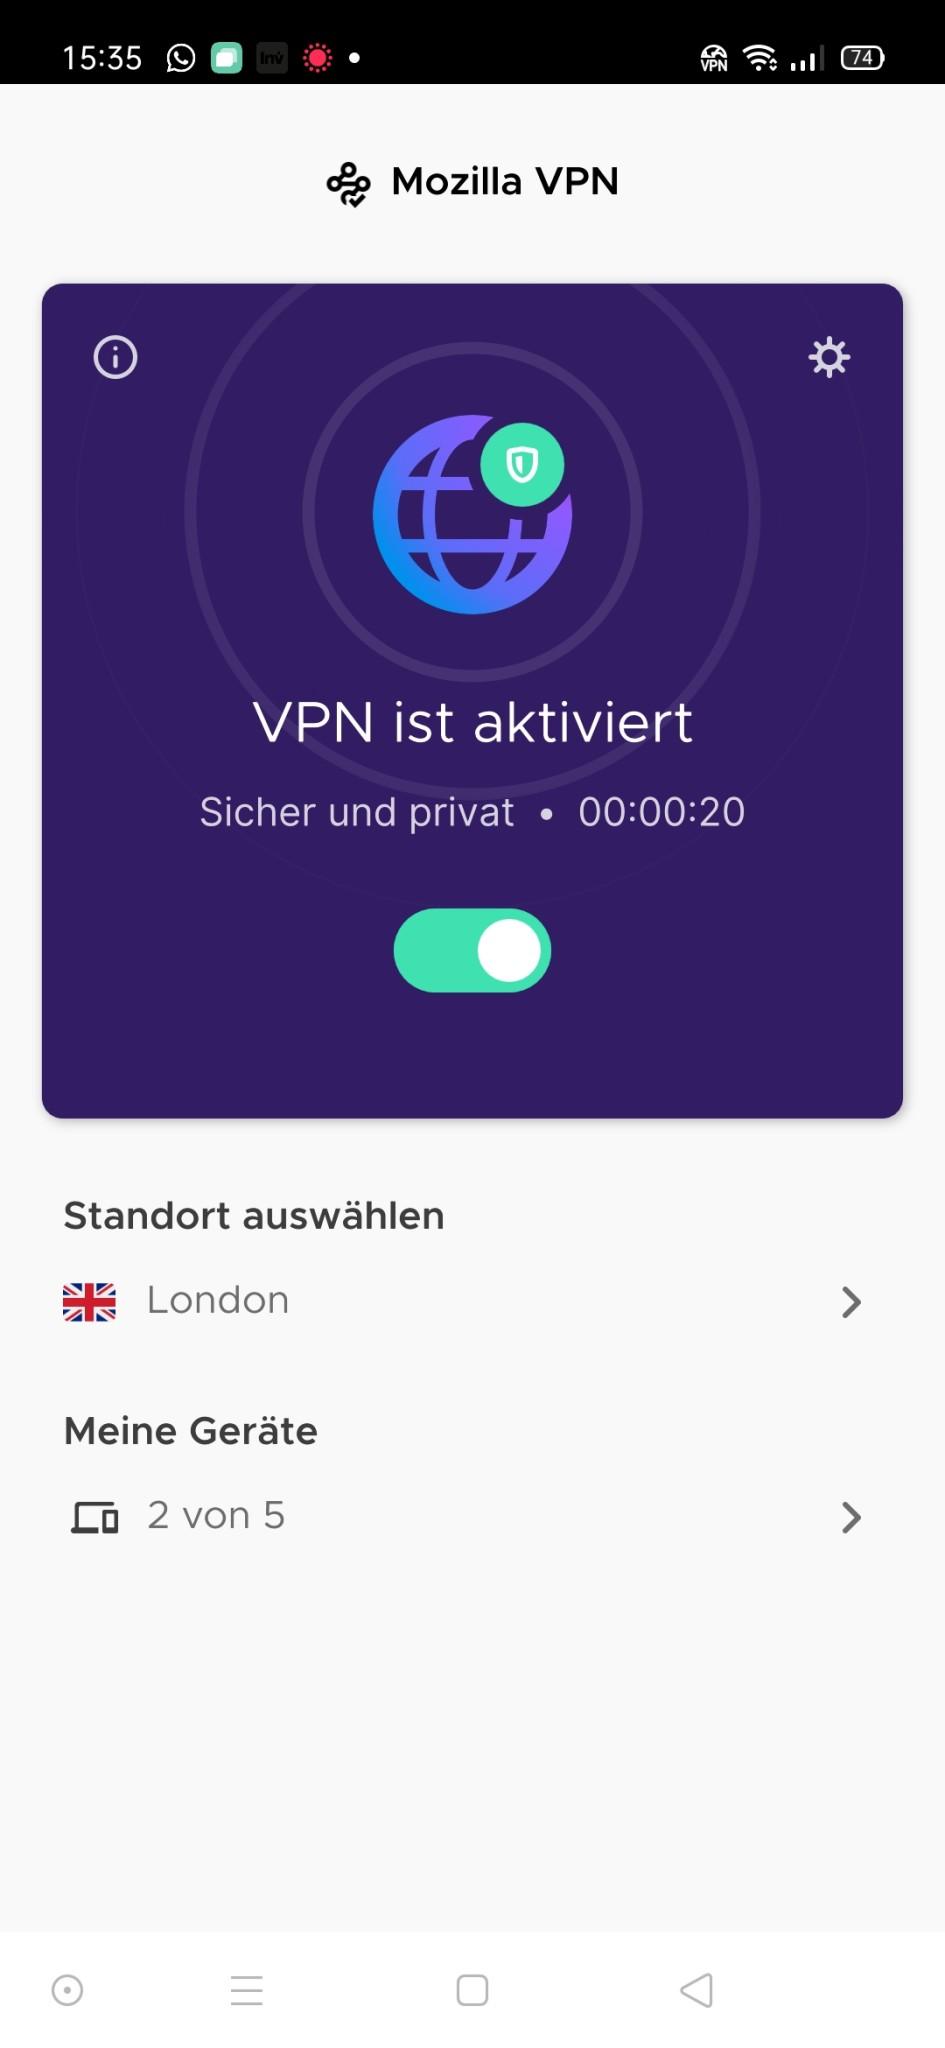 Screenshot 1 - Mozilla VPN (Android-App)